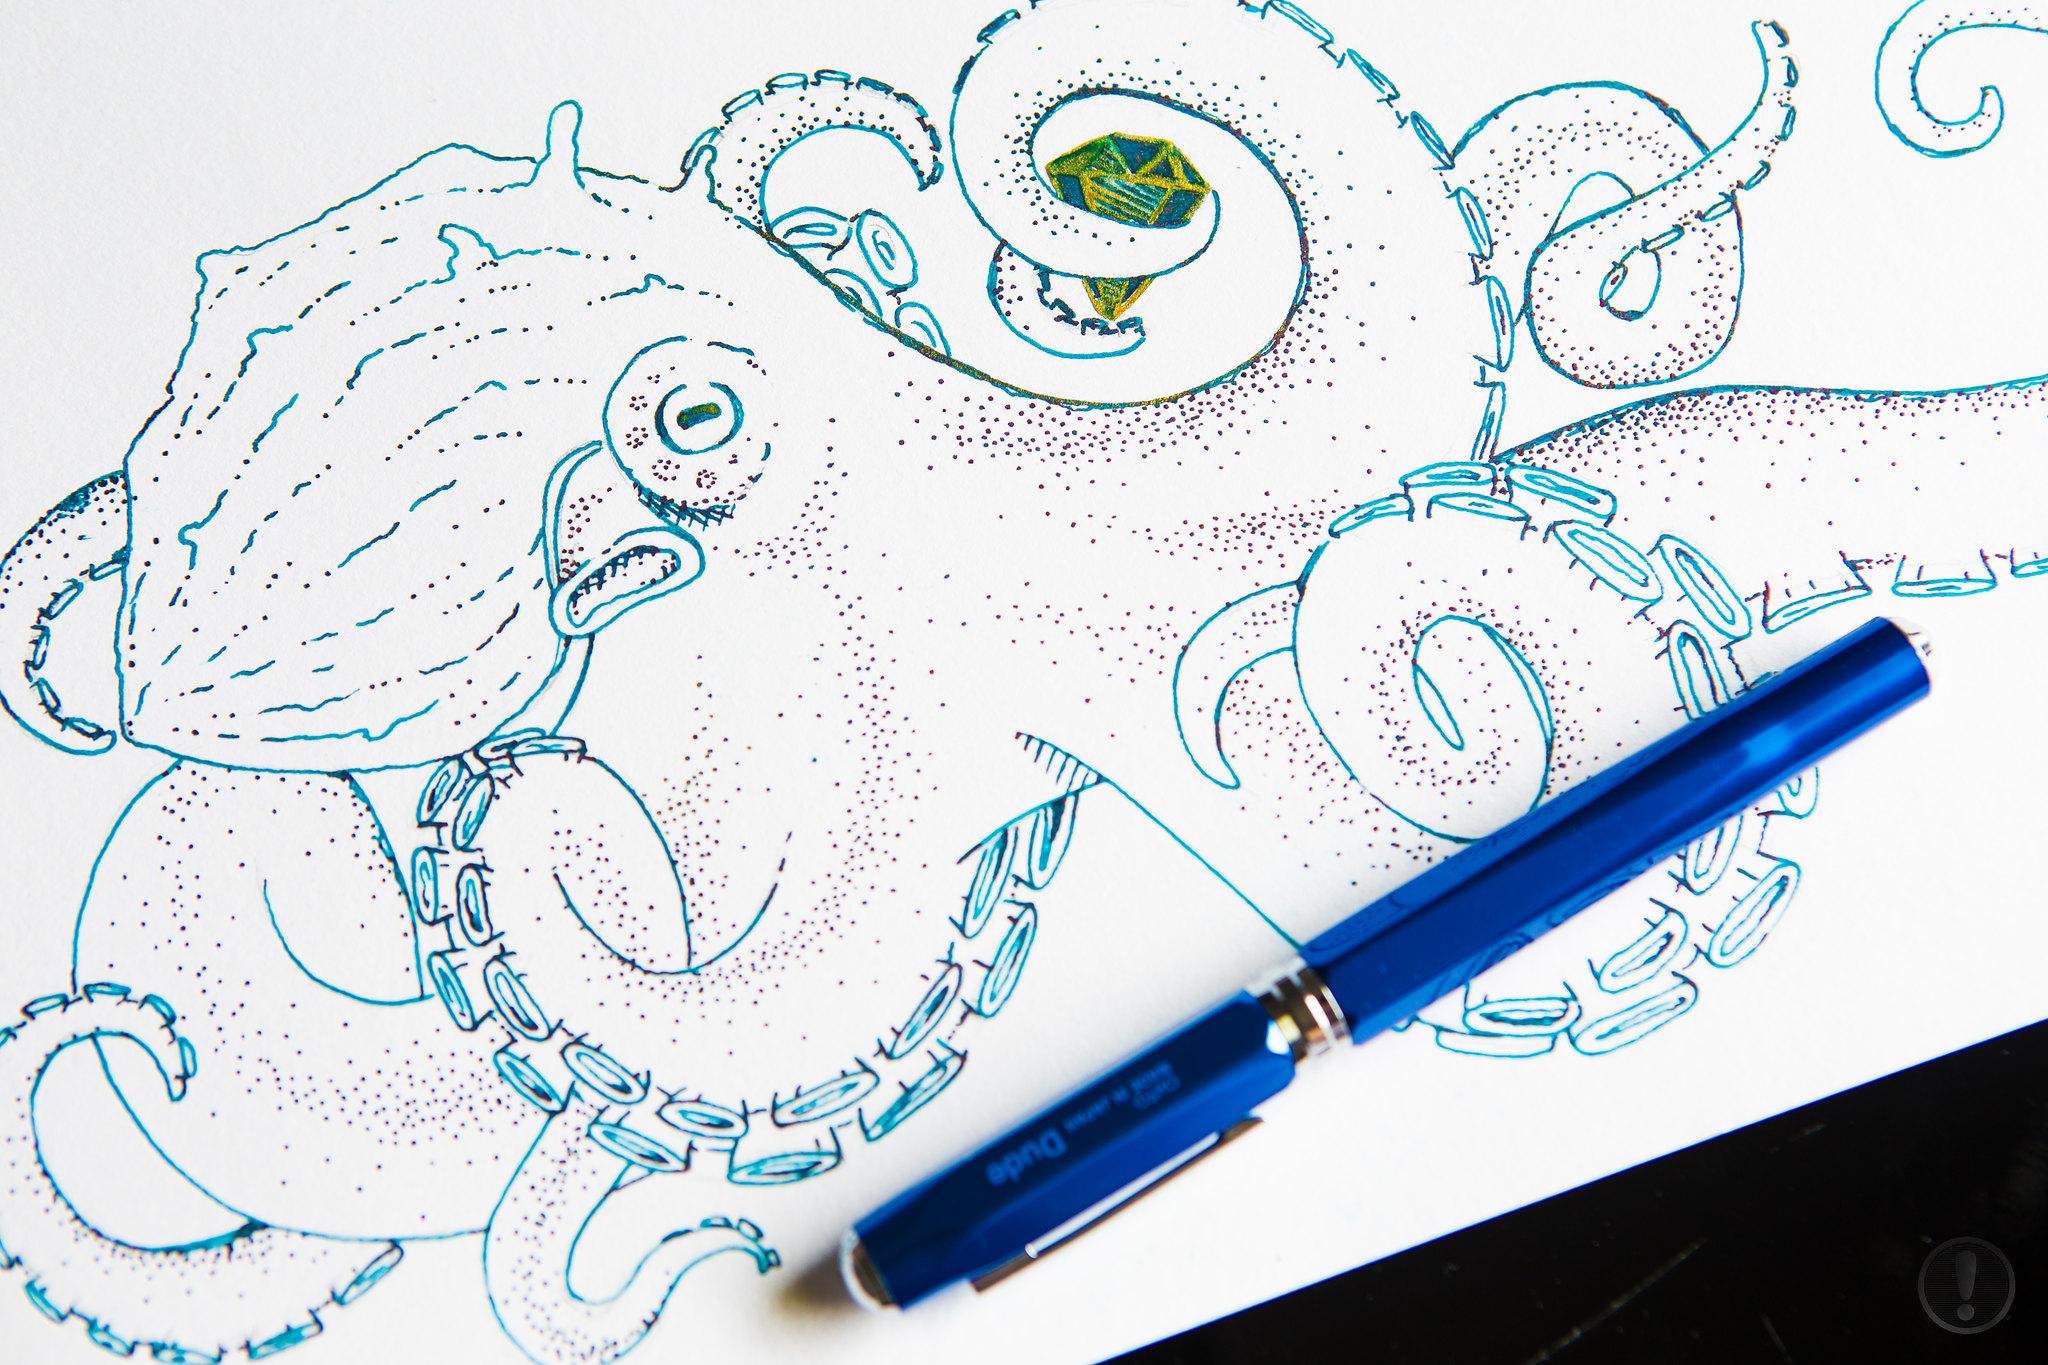 Geekhack Handwriting Thread And Fountain Pen Circuit Board Rollerball Ink Nerd Gift